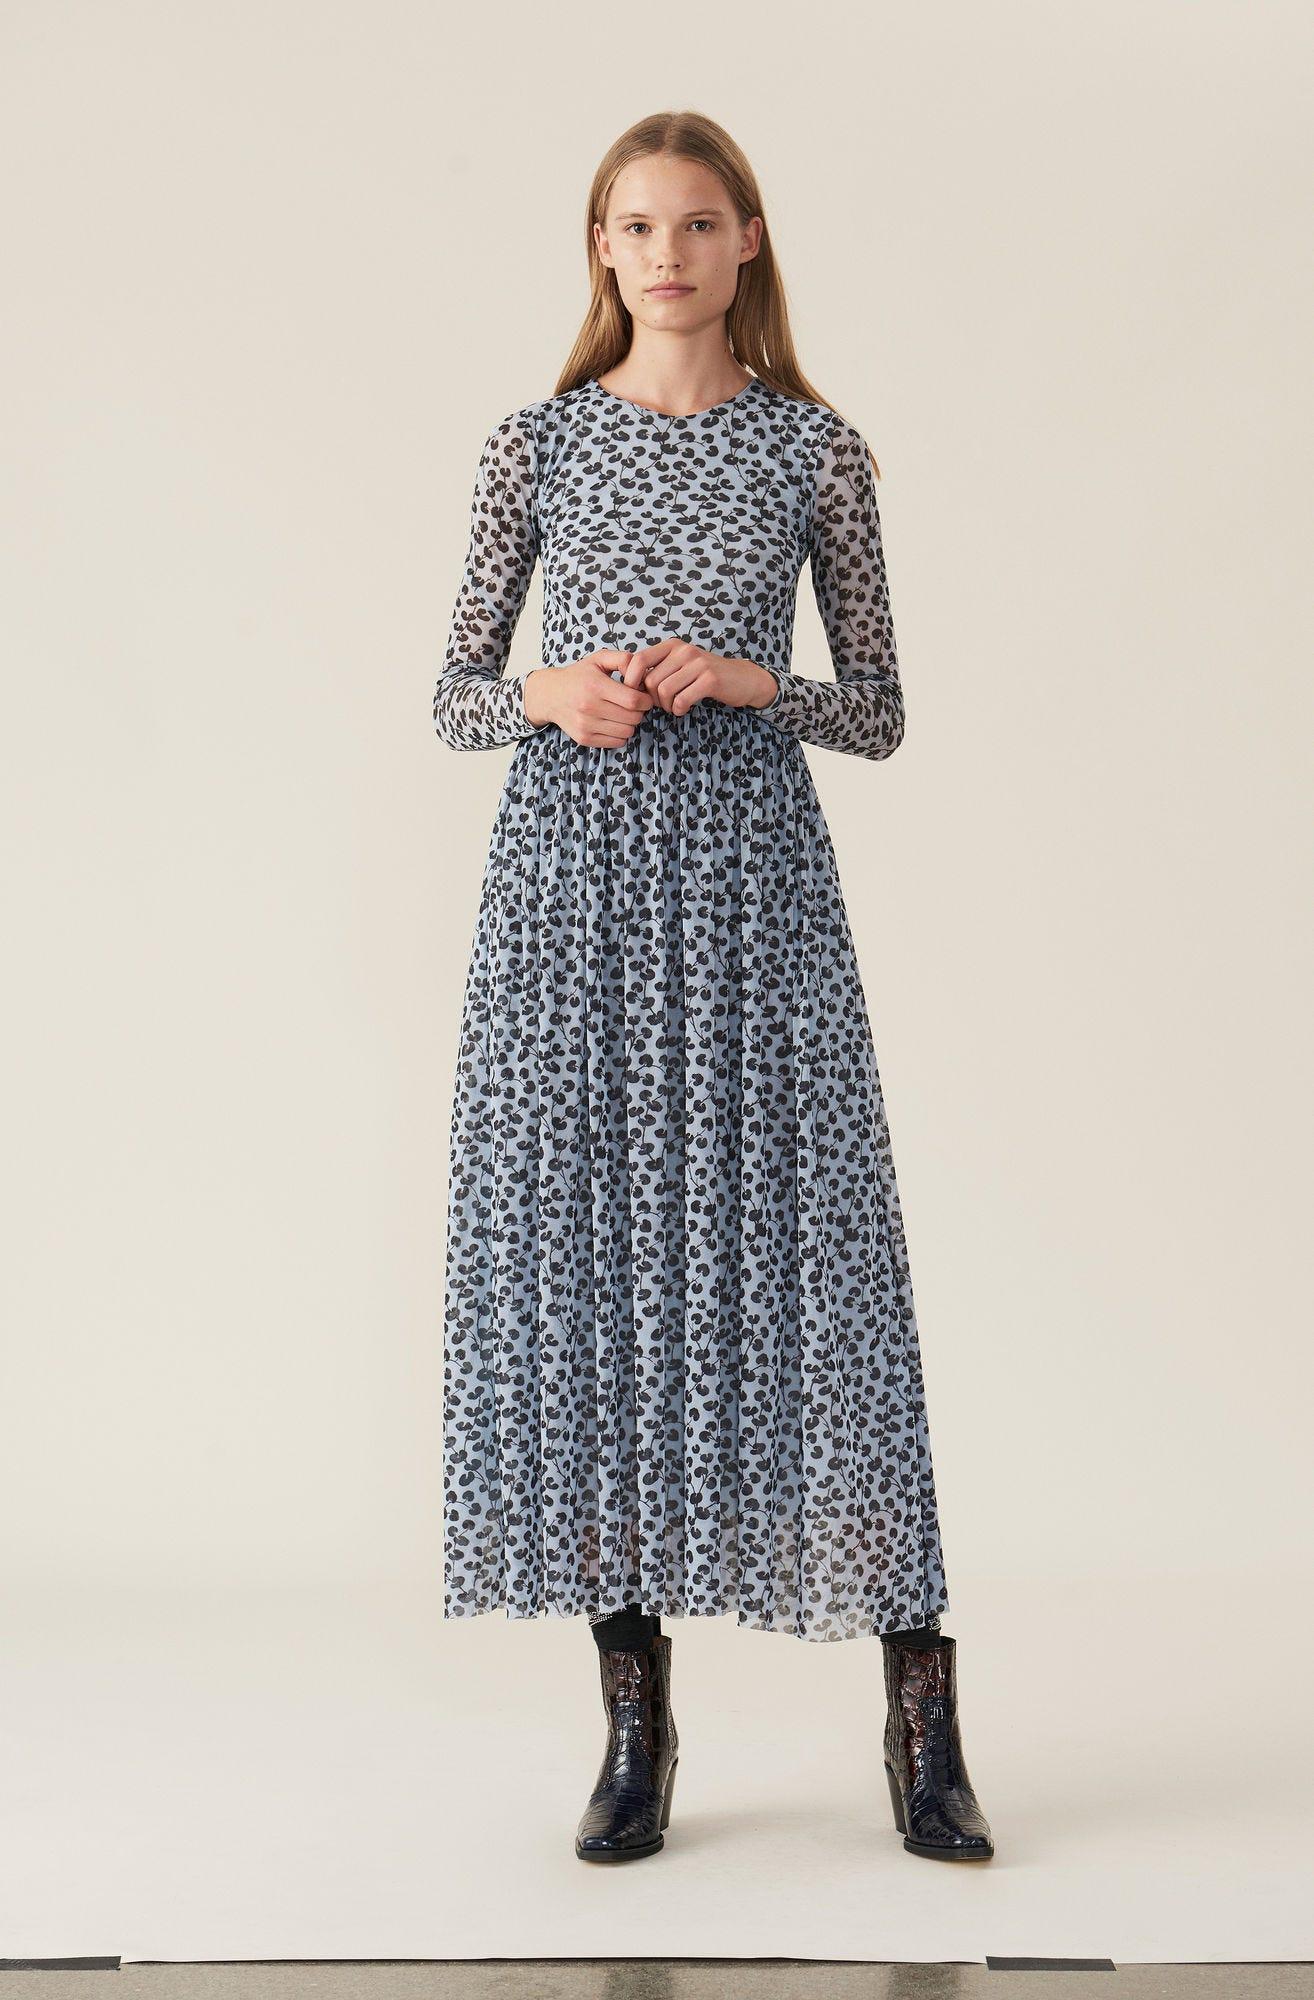 ac1a1292 Work Dresses, Office Attire For Women 2018